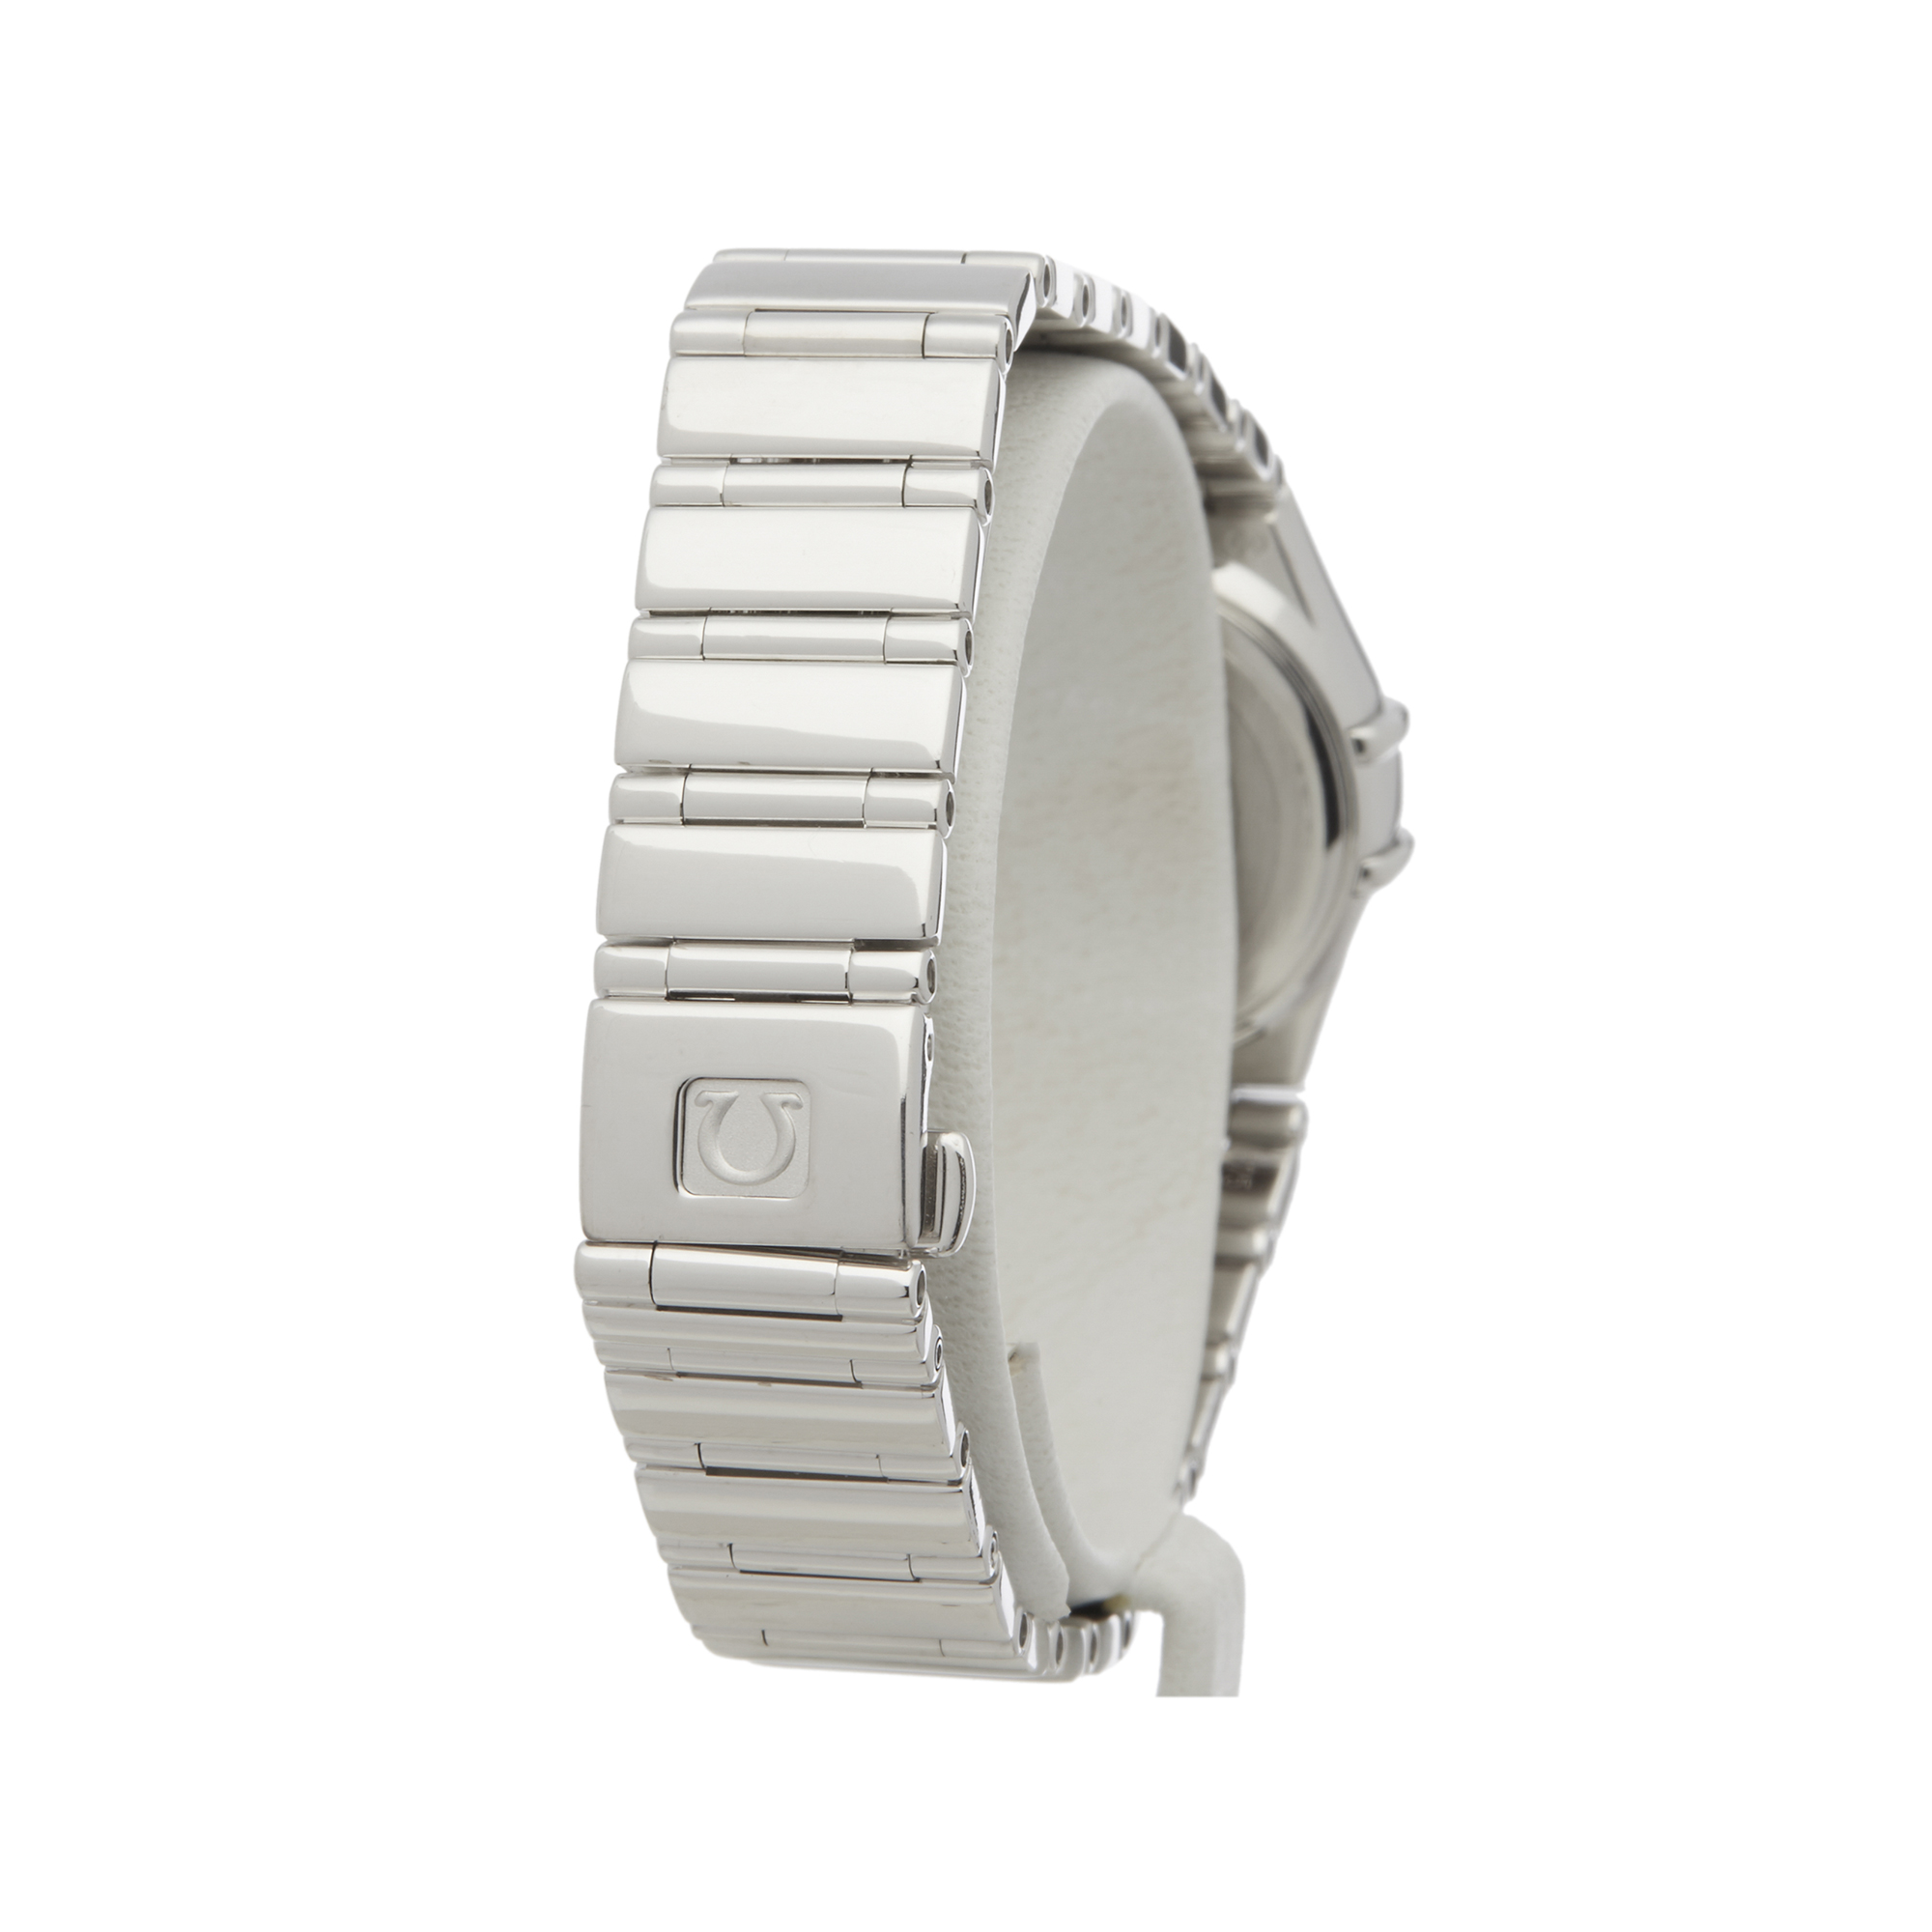 Omega Constellation 0 1165.36 Ladies White Gold Diamond Watch - Image 4 of 7